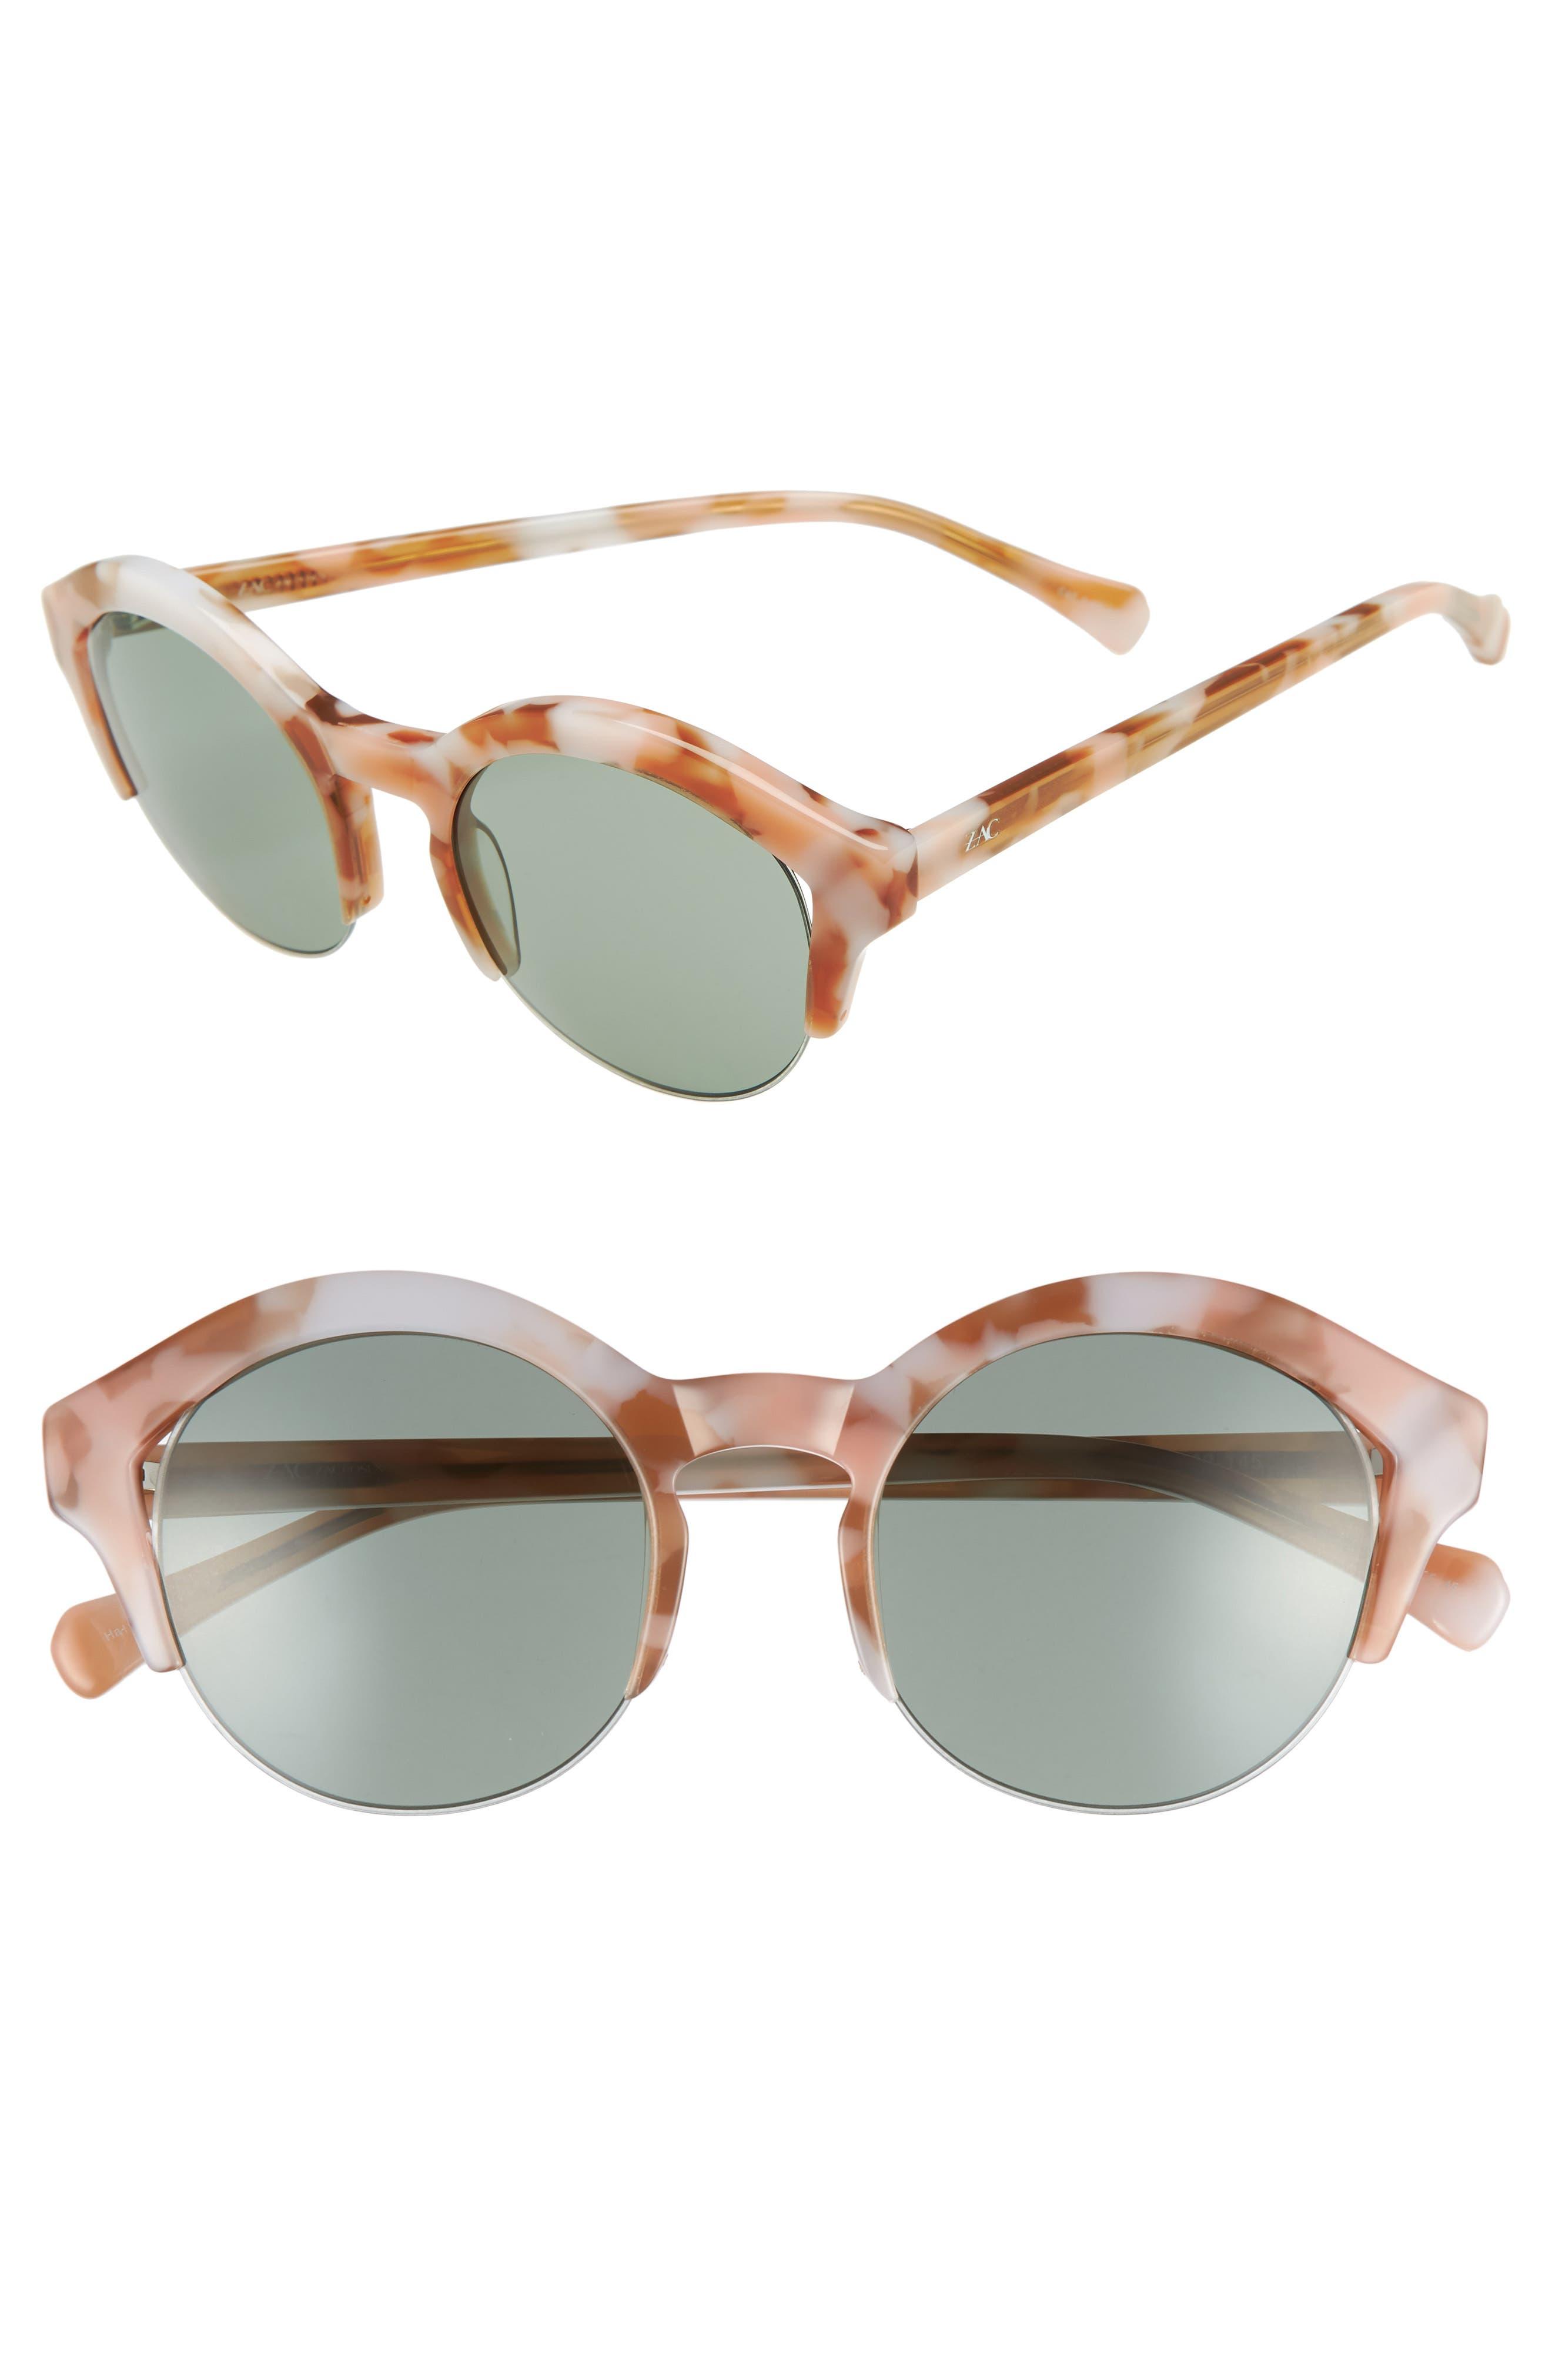 ZAC Zac Posen Bren 51mm Half-Rim Sunglasses